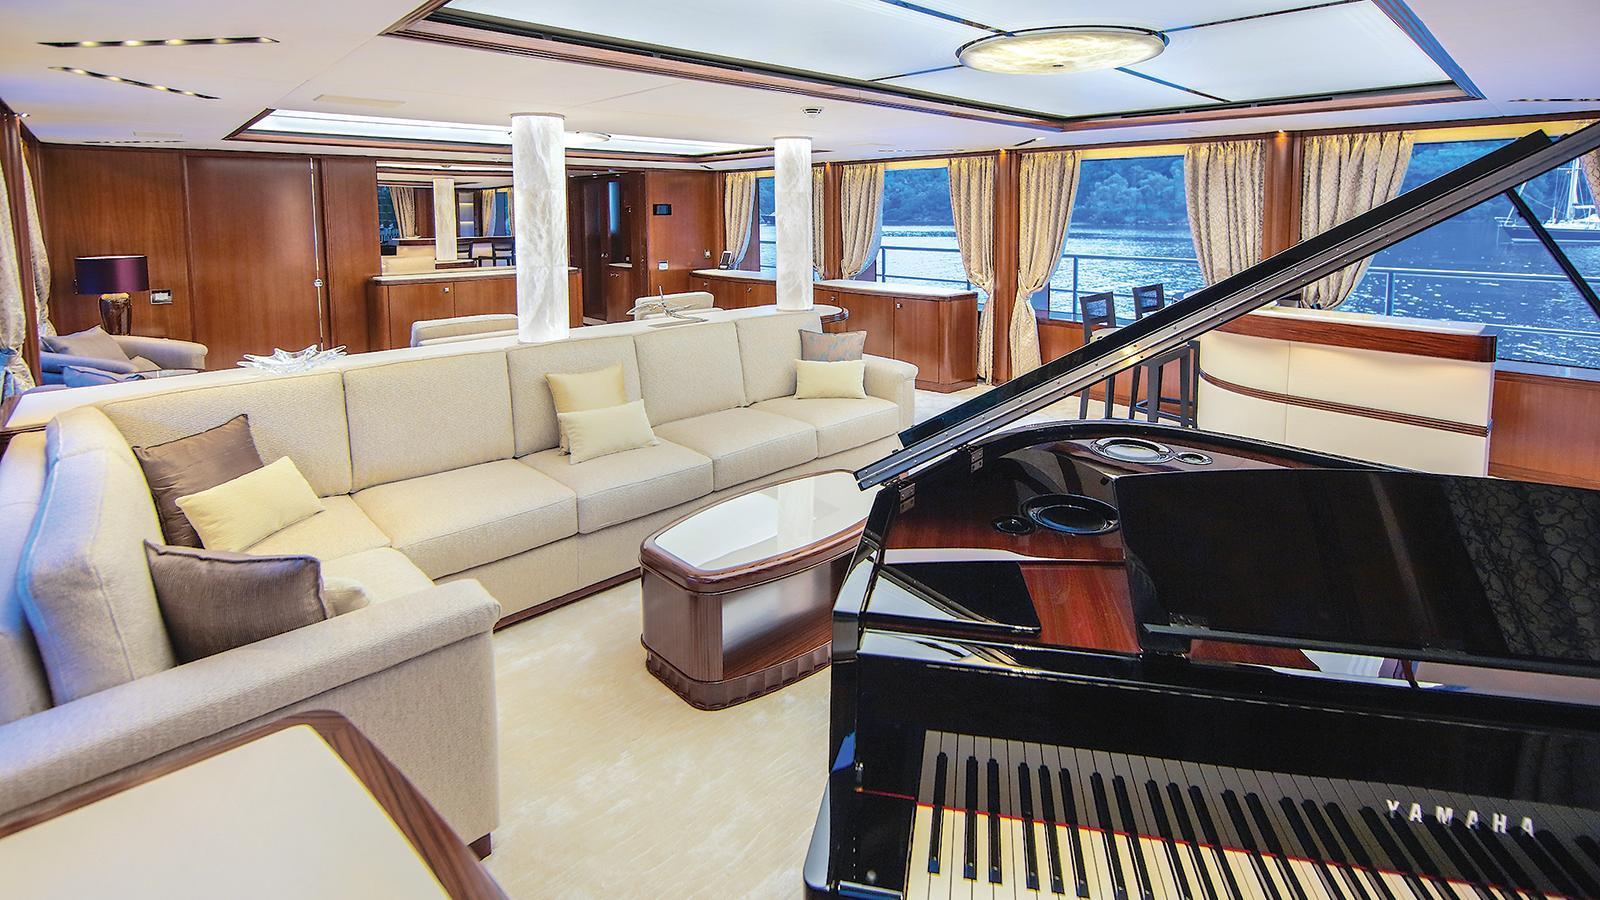 vica-motor-yacht-benetti-2015-50m-saloon